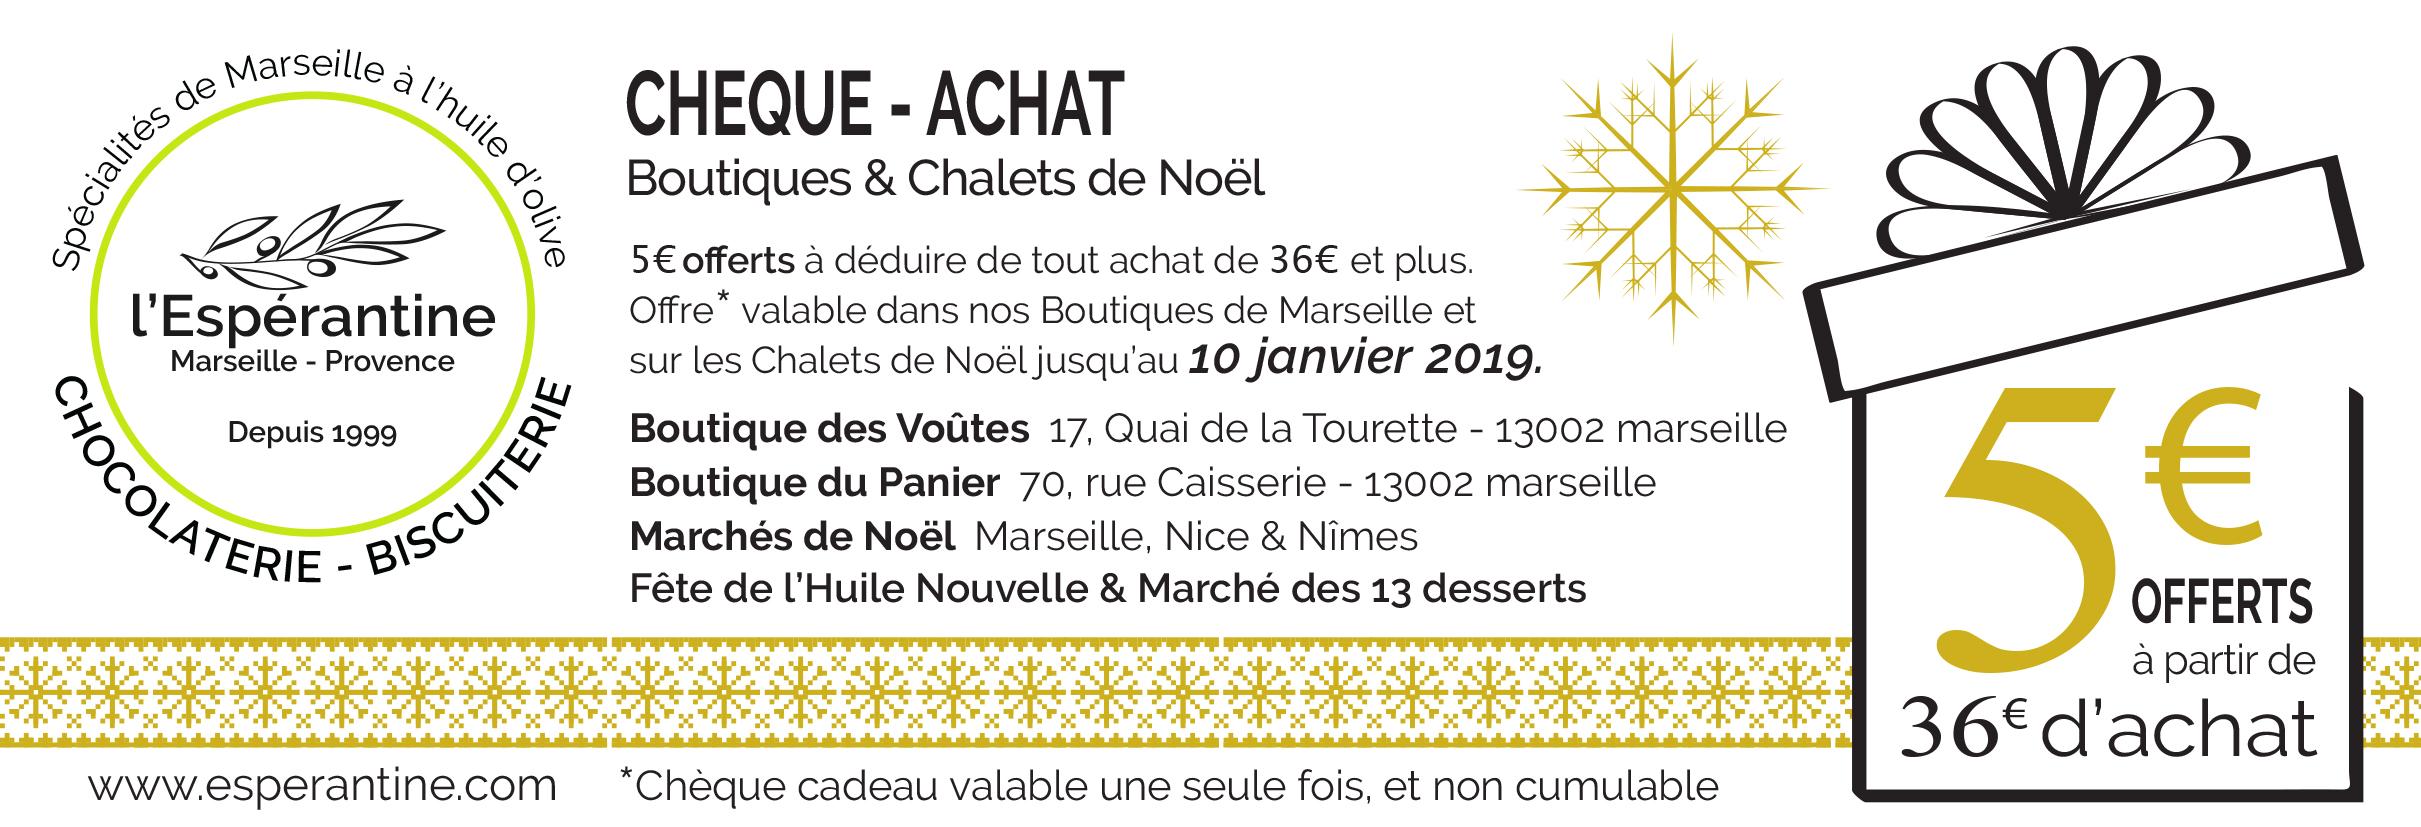 AchatsBoutiques&ChaletsNoel.jpg